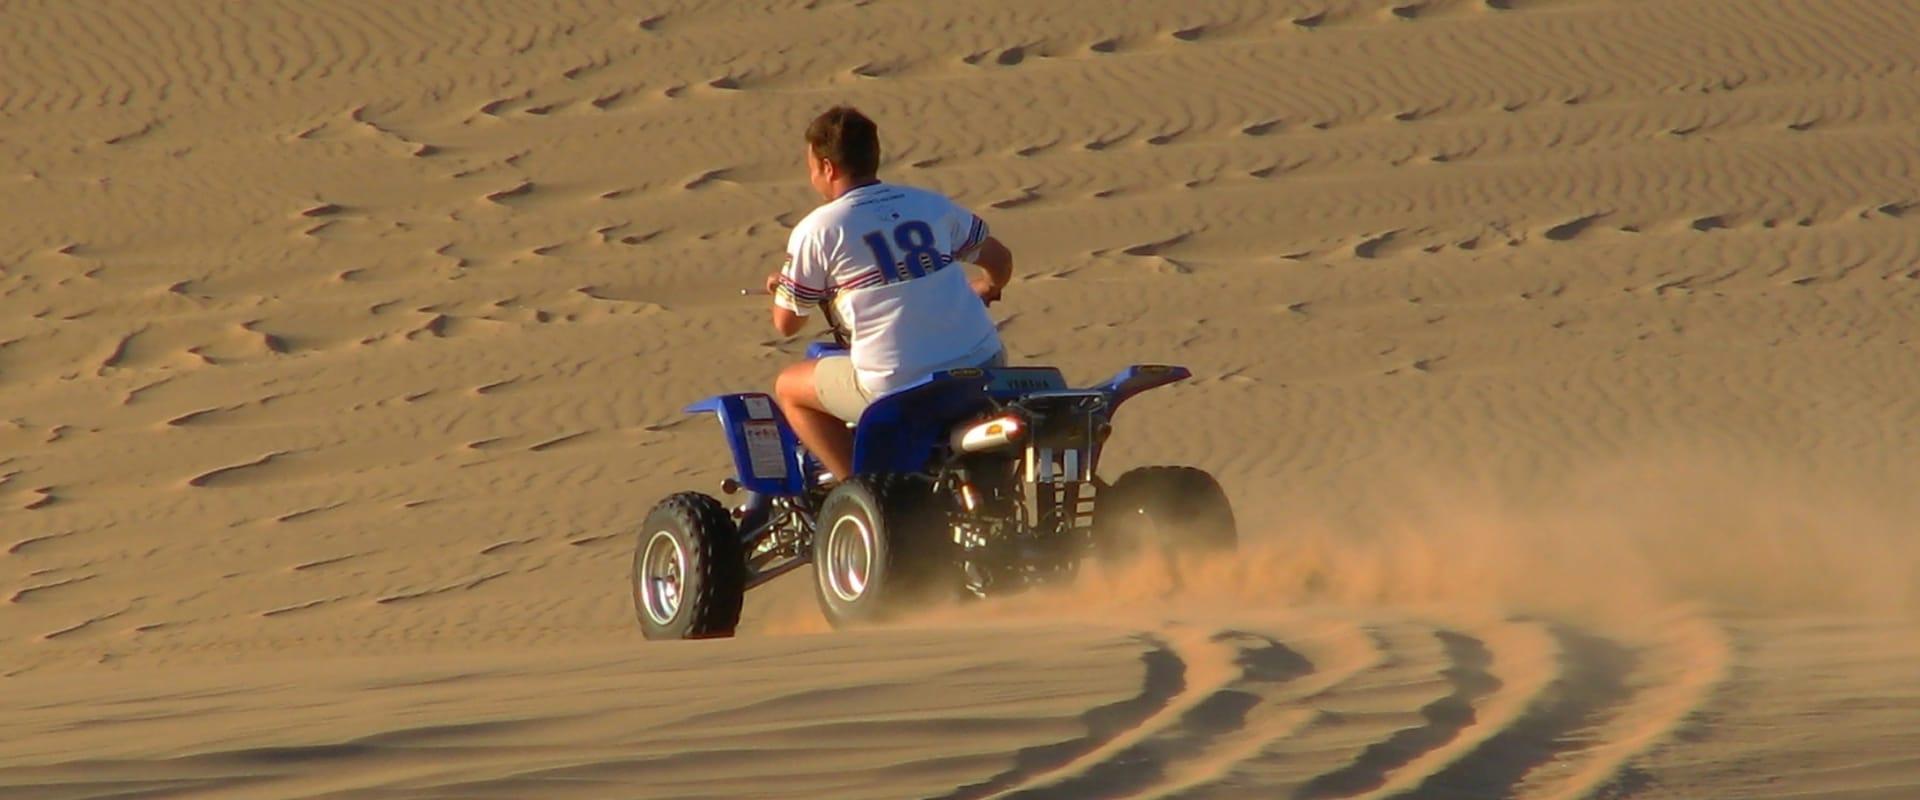 Ride a quad bike